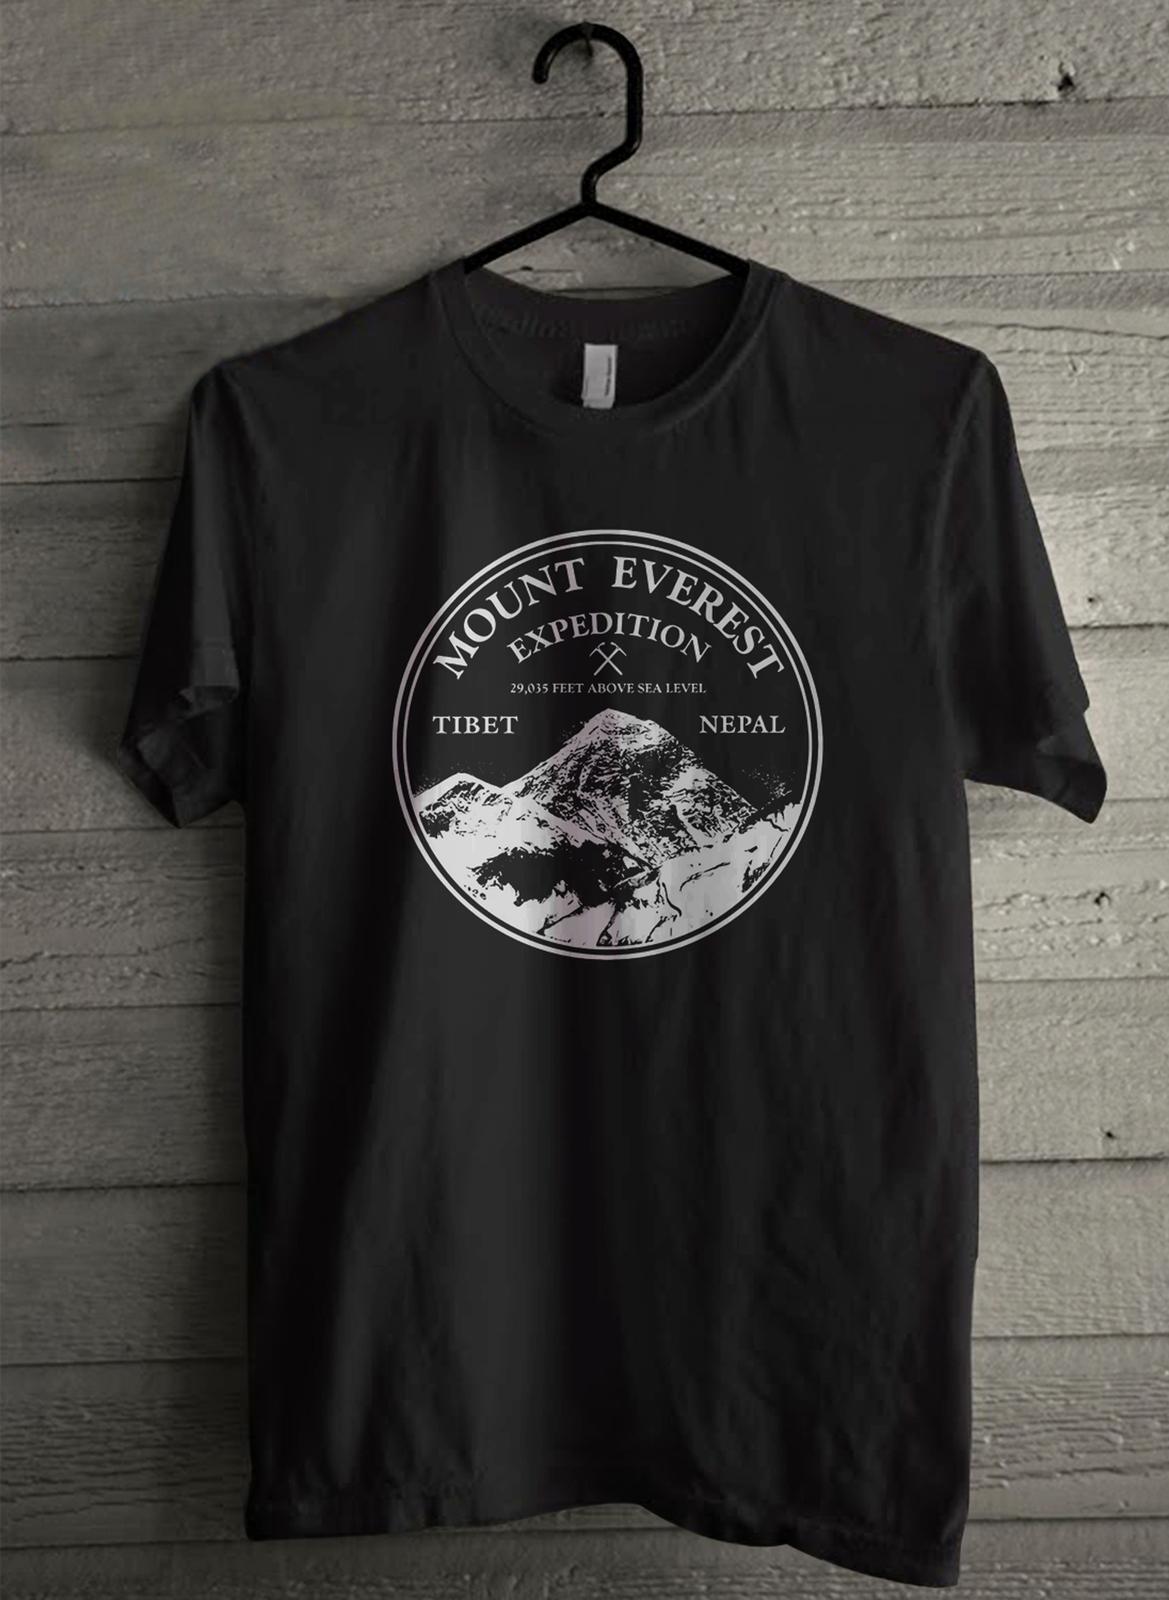 Mount Everest Expedition - Custom Men's T-Shirt (4850)